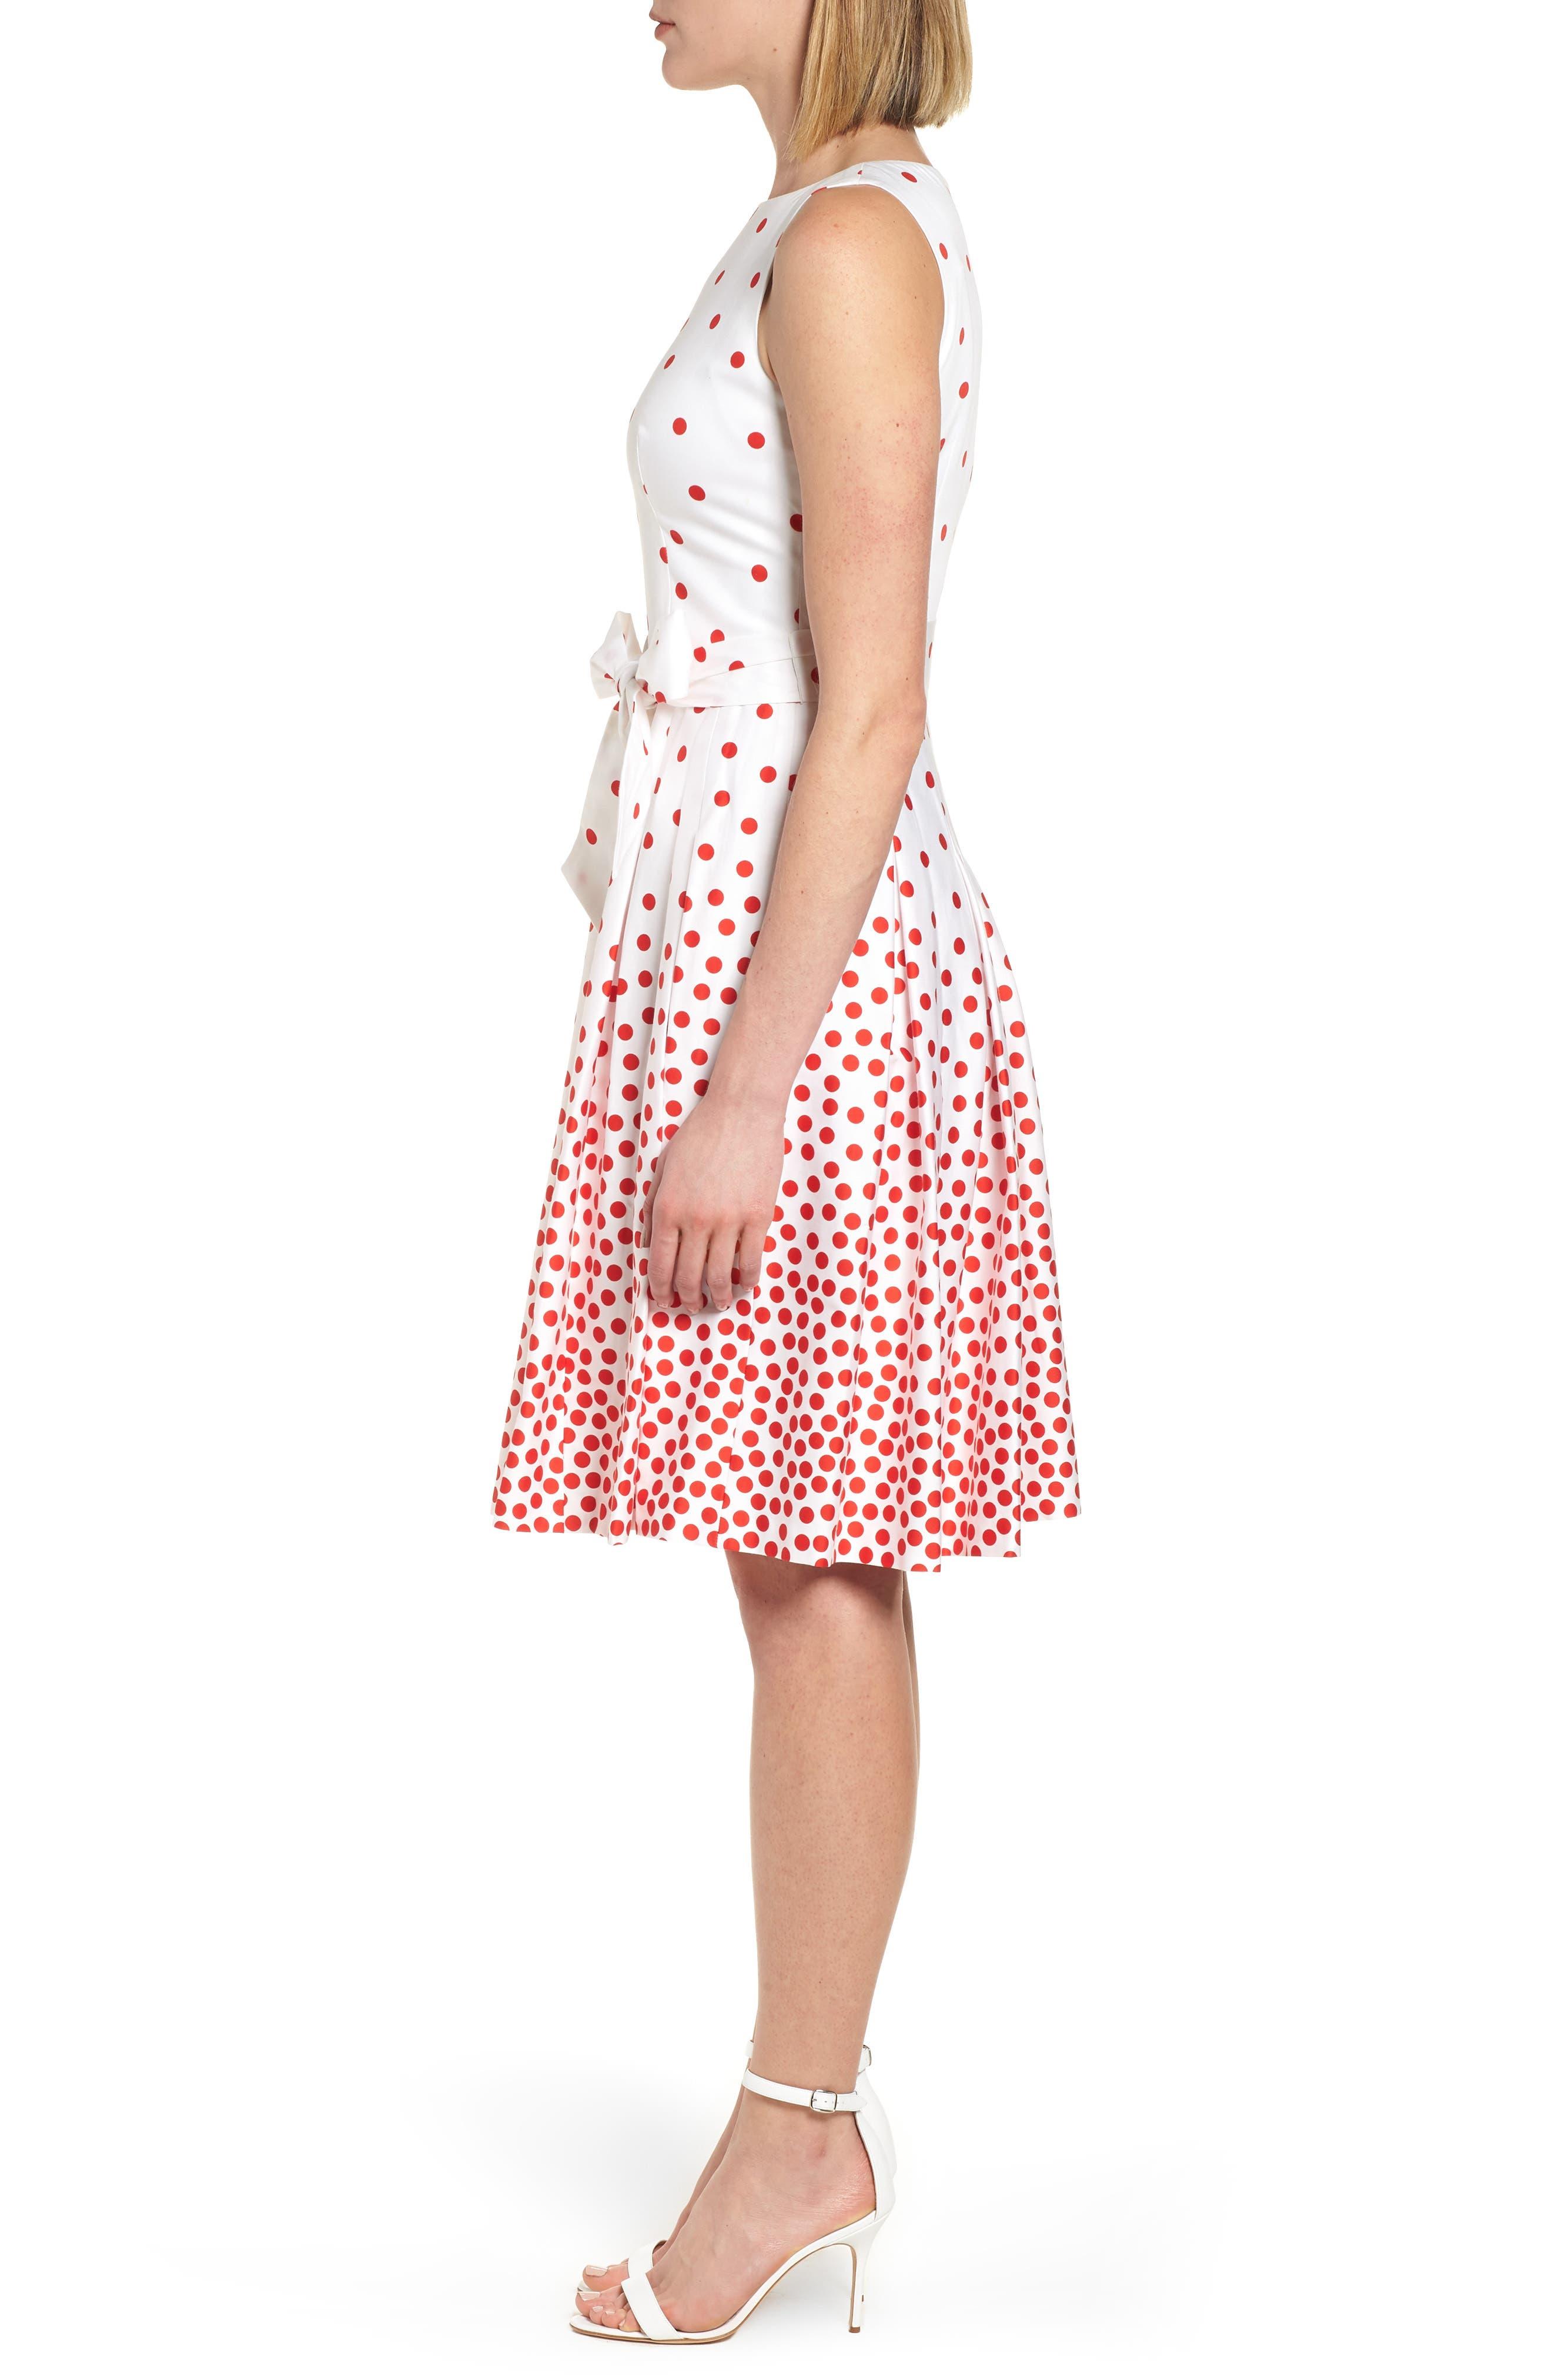 New York Scattered Dot Stretch Cotton Dress,                             Alternate thumbnail 3, color,                             Optic White/ Tomato